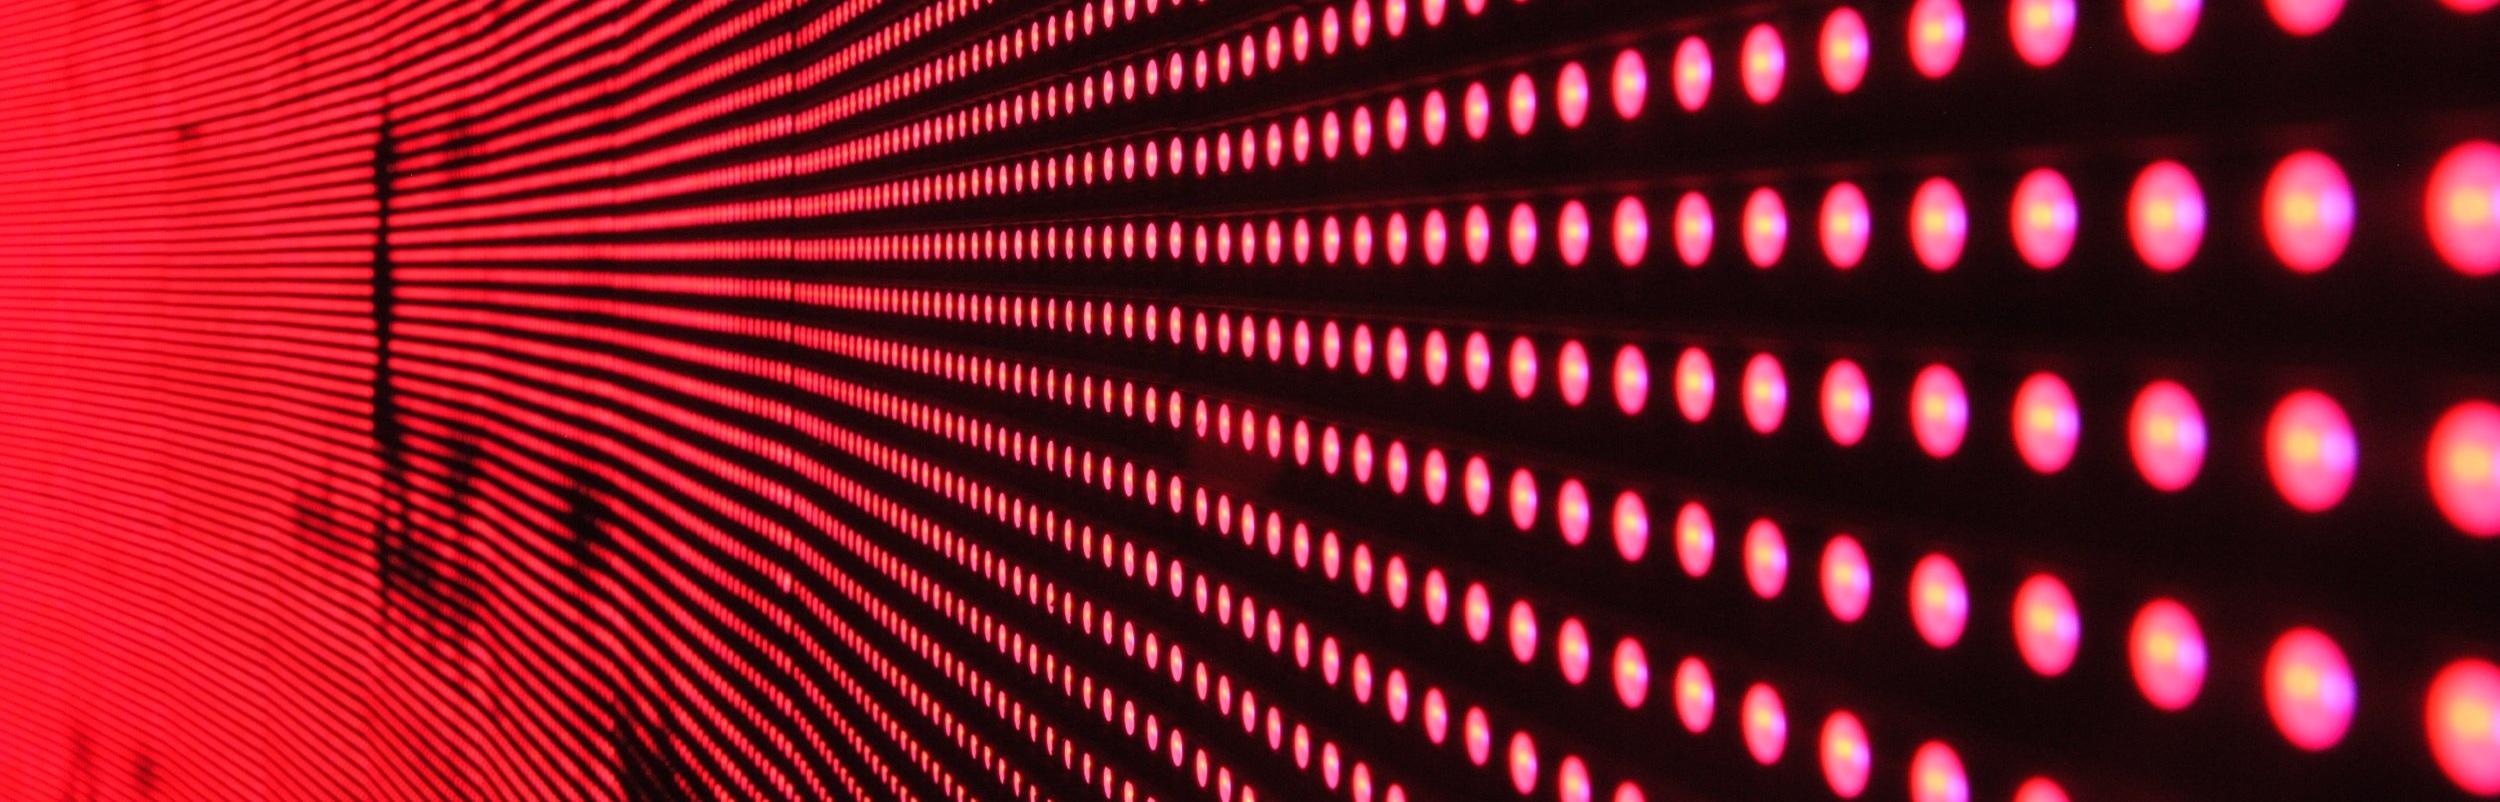 art-big-data-bright-158826.jpg